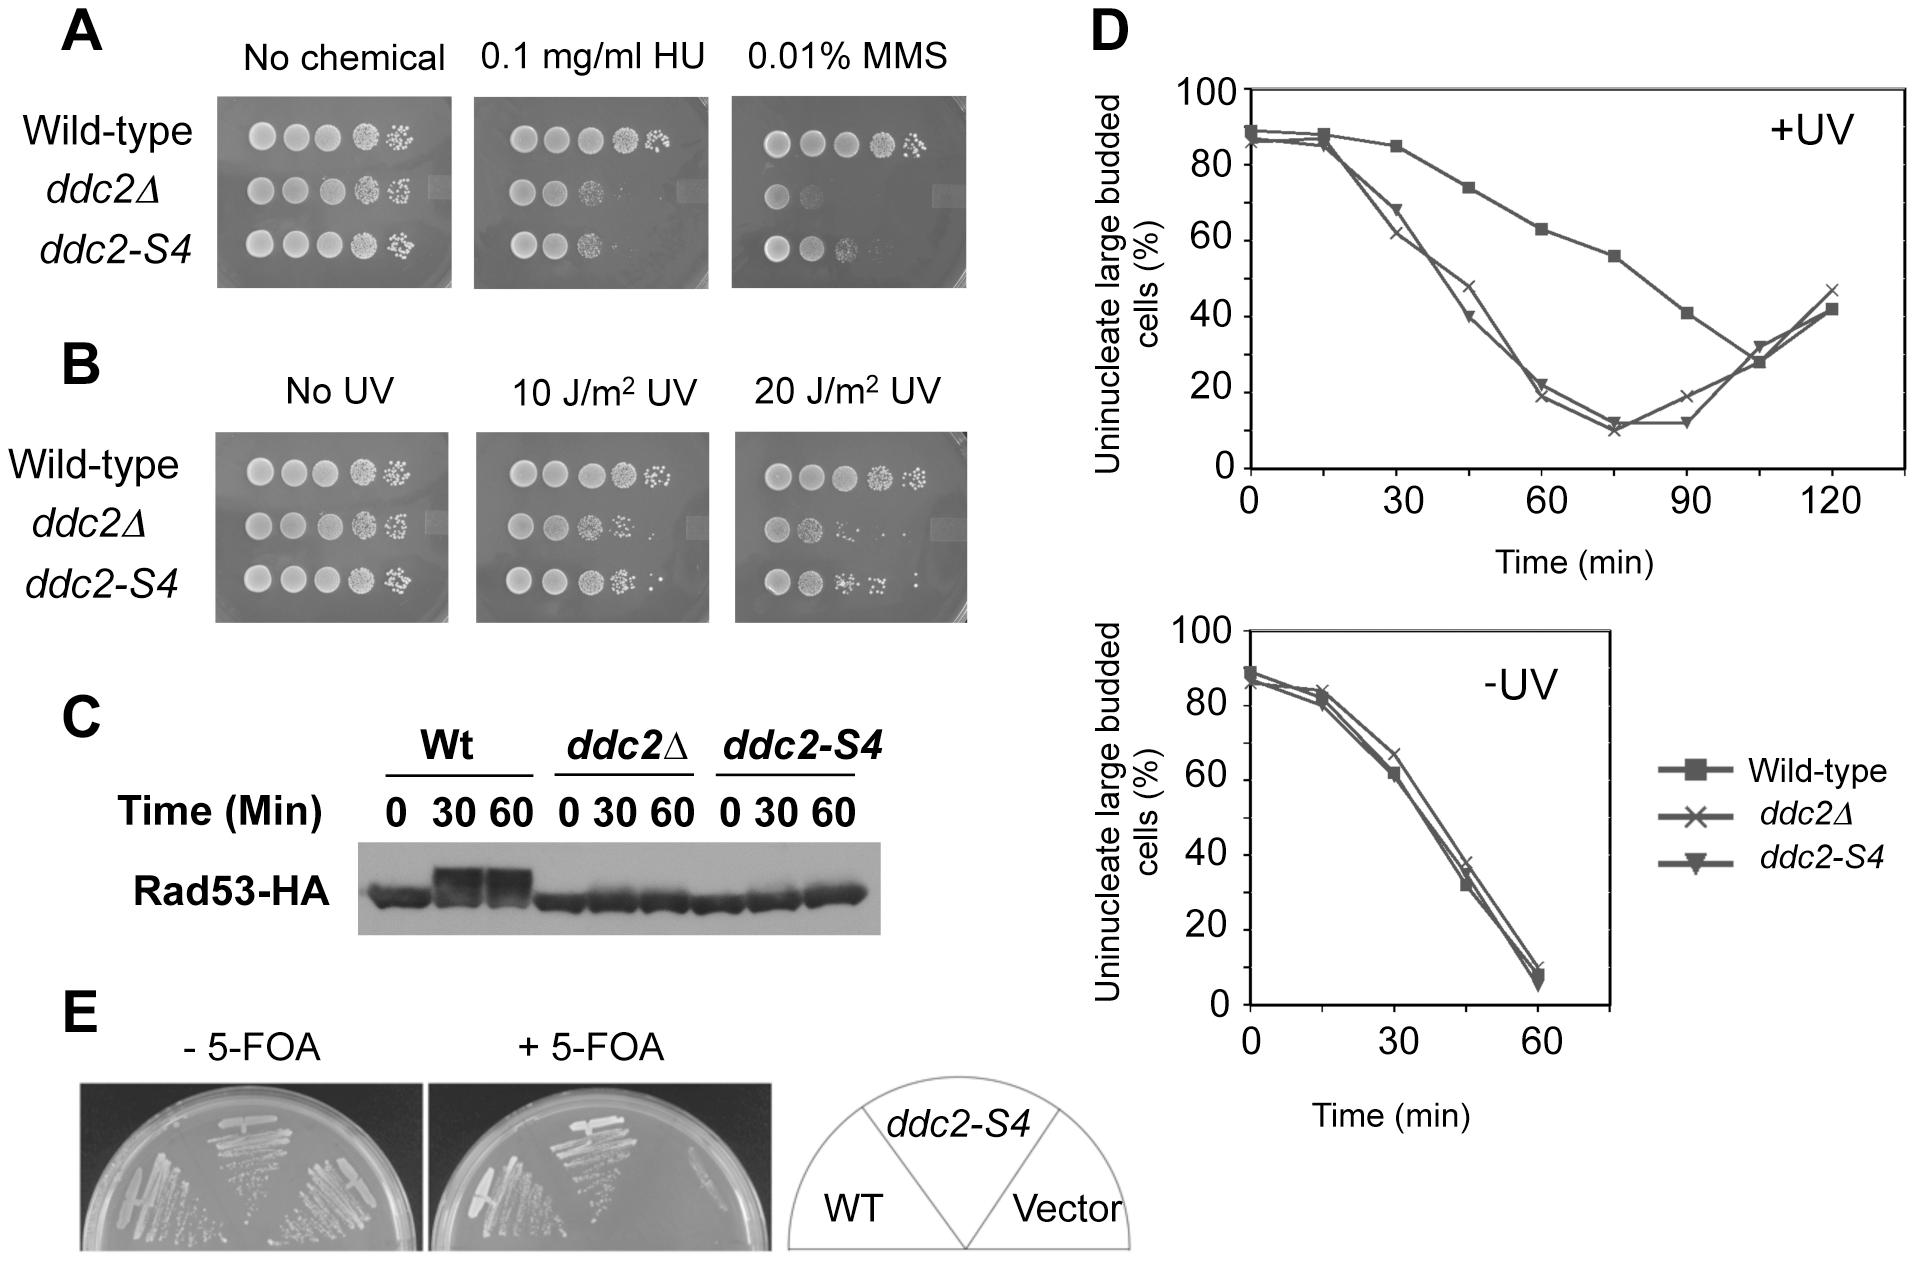 DNA damage response and proliferation of <i>ddc2-S4</i> mutants.